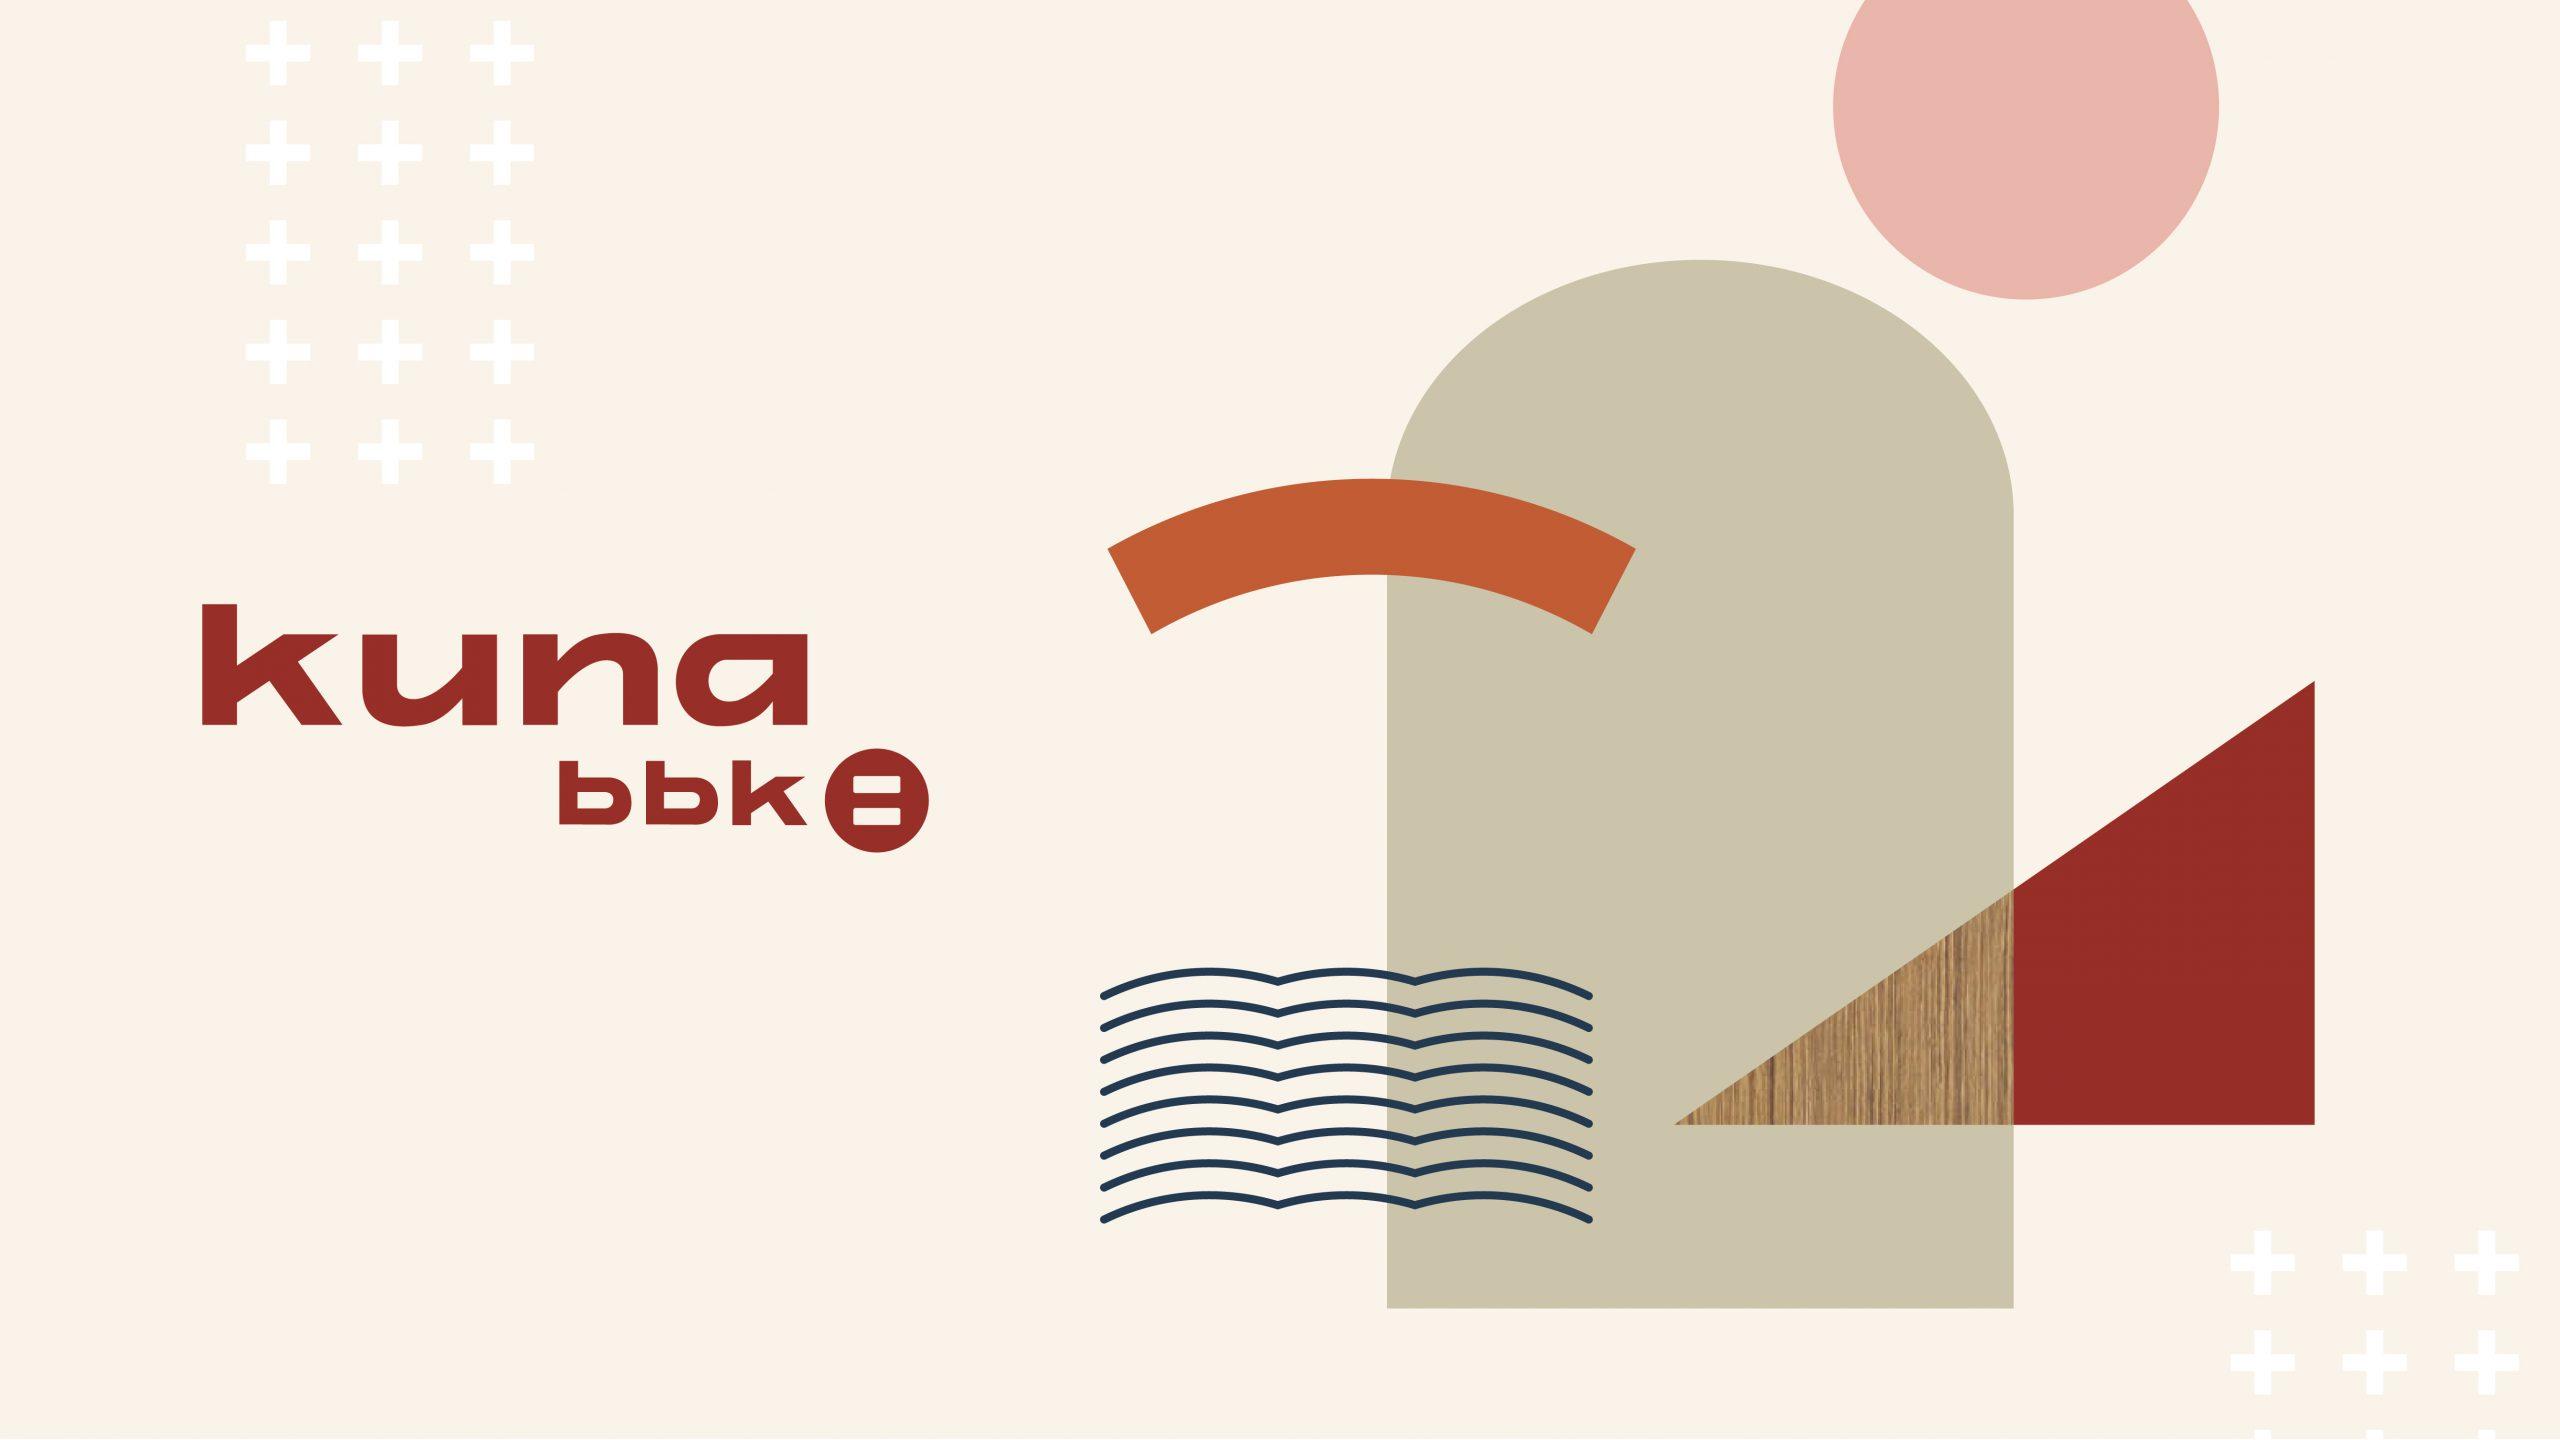 IED Kunsthal Bilbao colabora con BBK Kuna